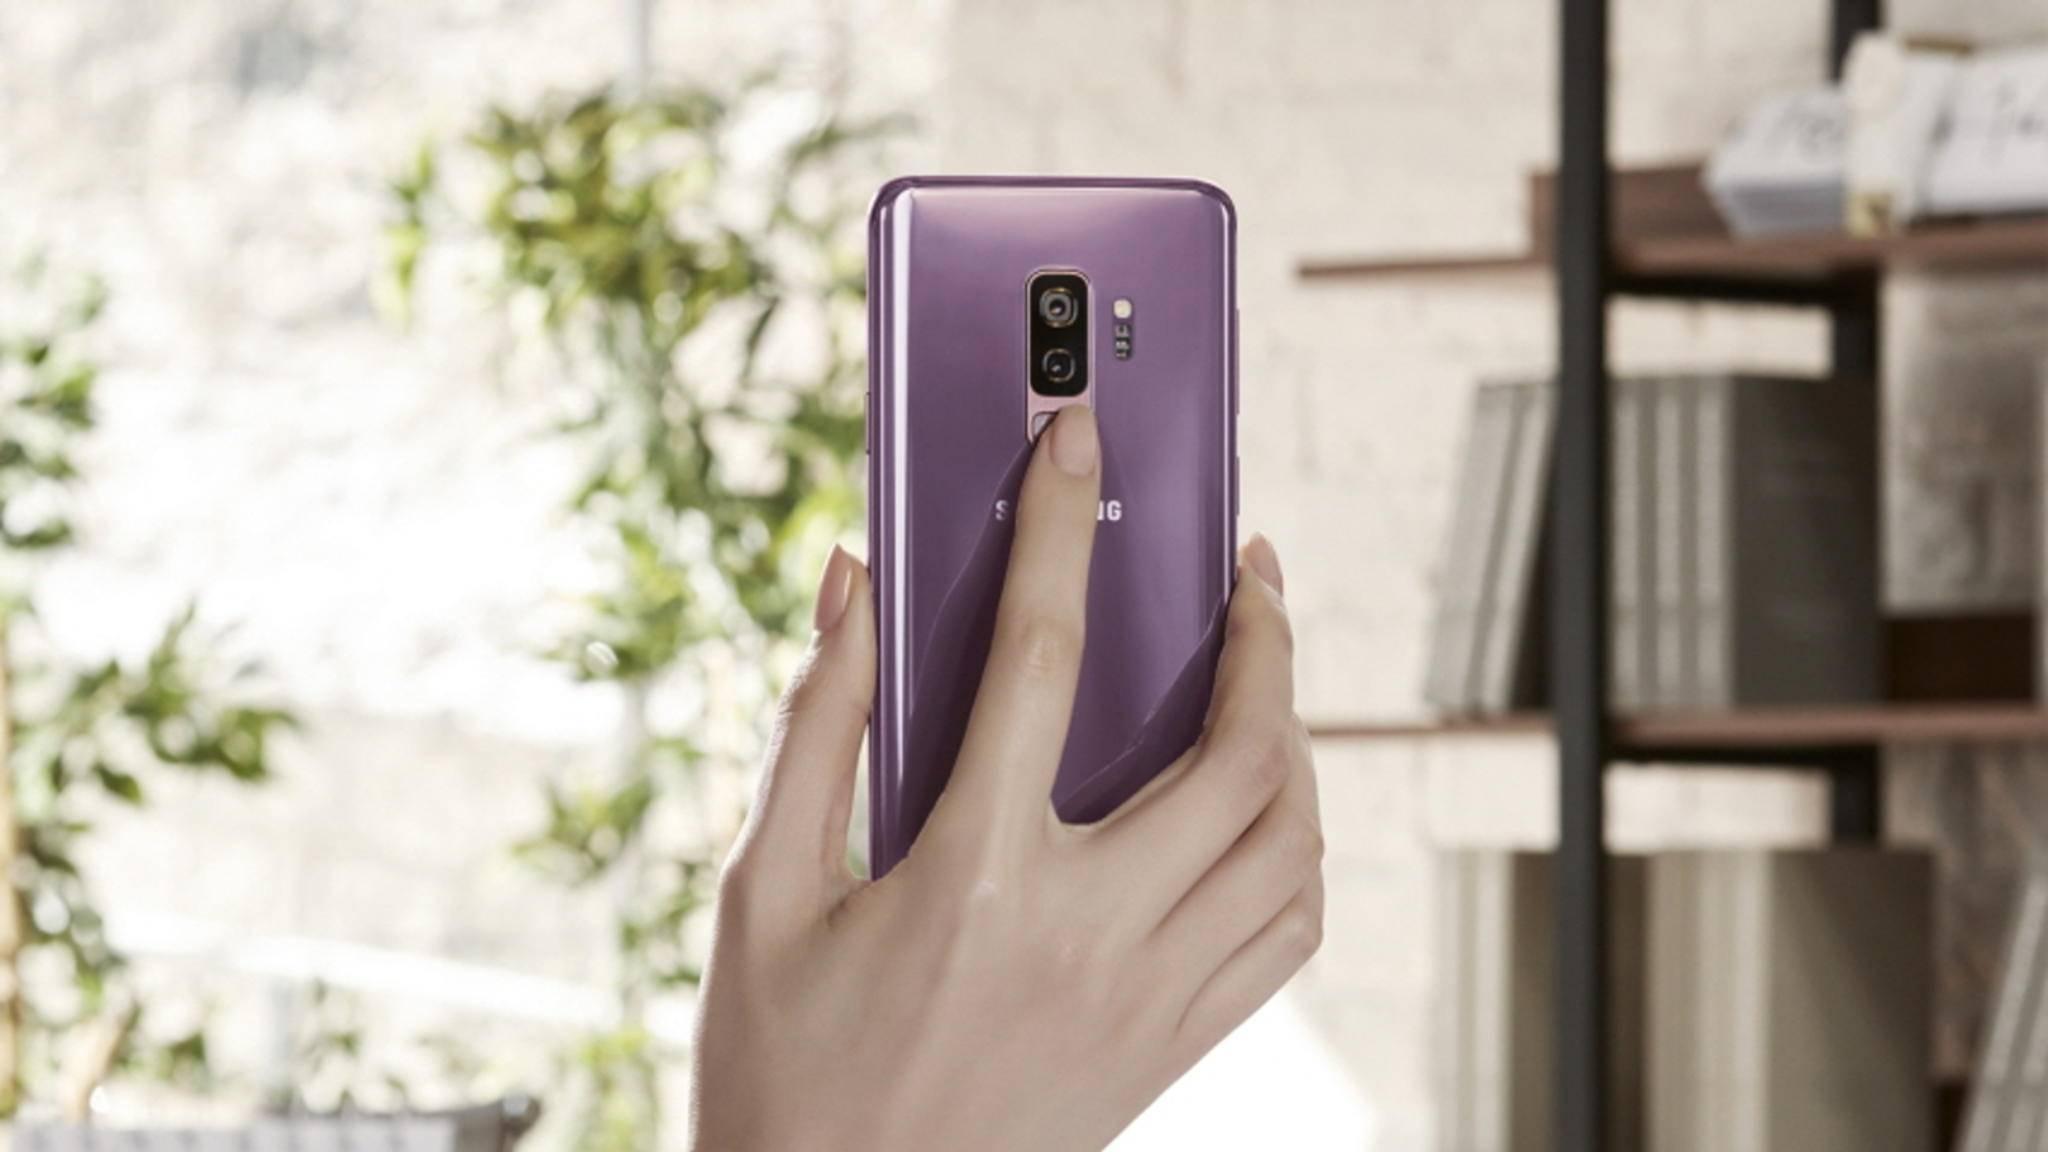 Der Fingerabdrucksensor ist, anders als beim S8, direkt unterhalb der Kamera angebracht.